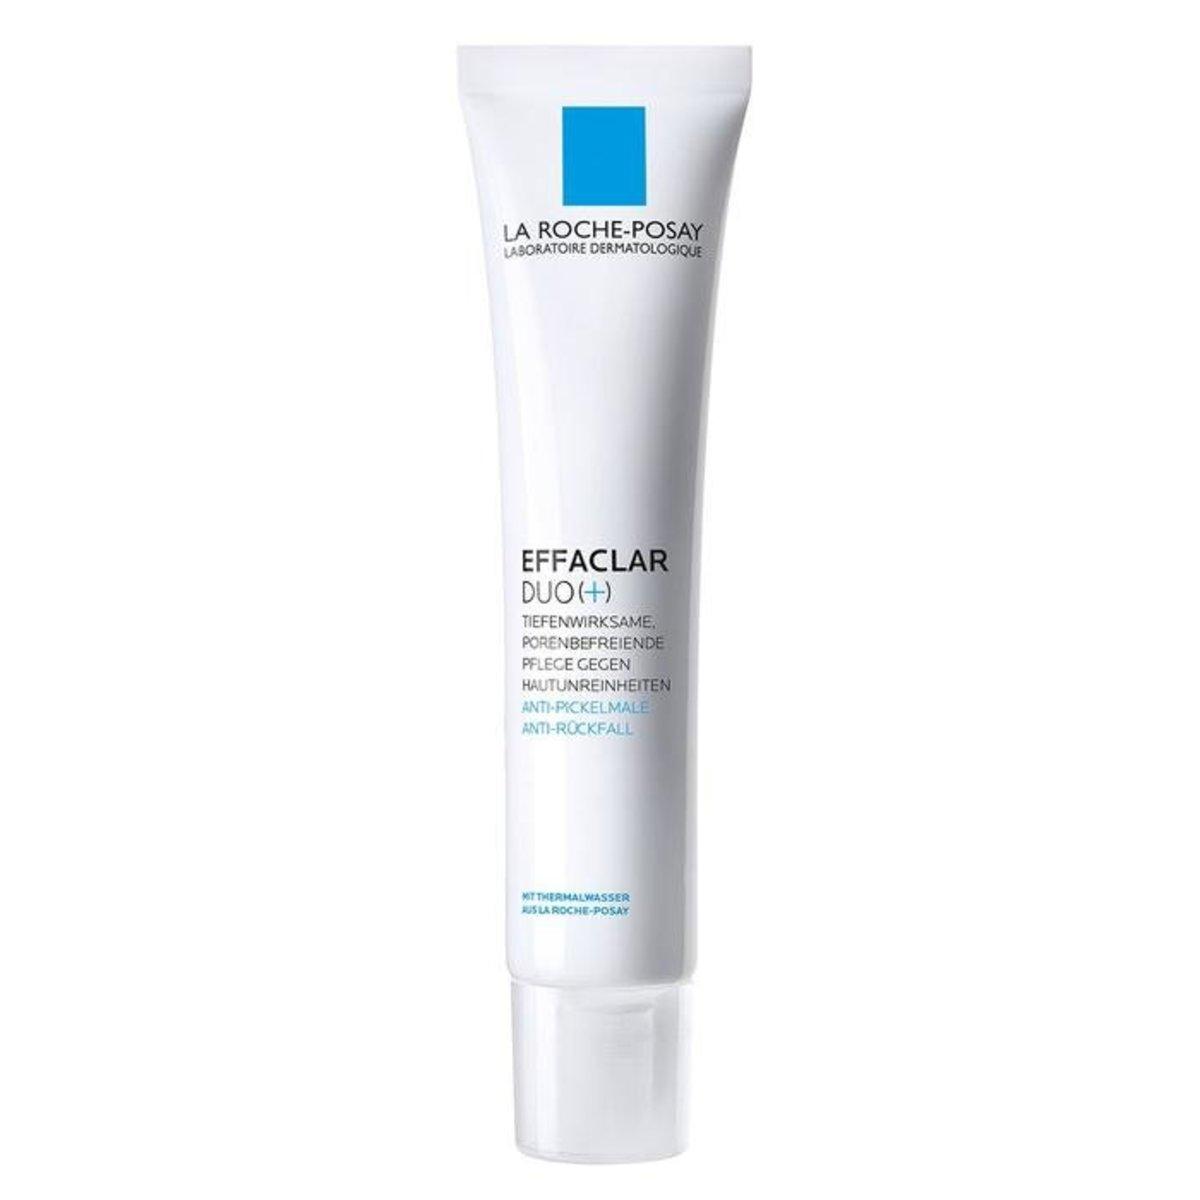 Effaclar Duo(+) 粉刺淨化雙效精華 40ml